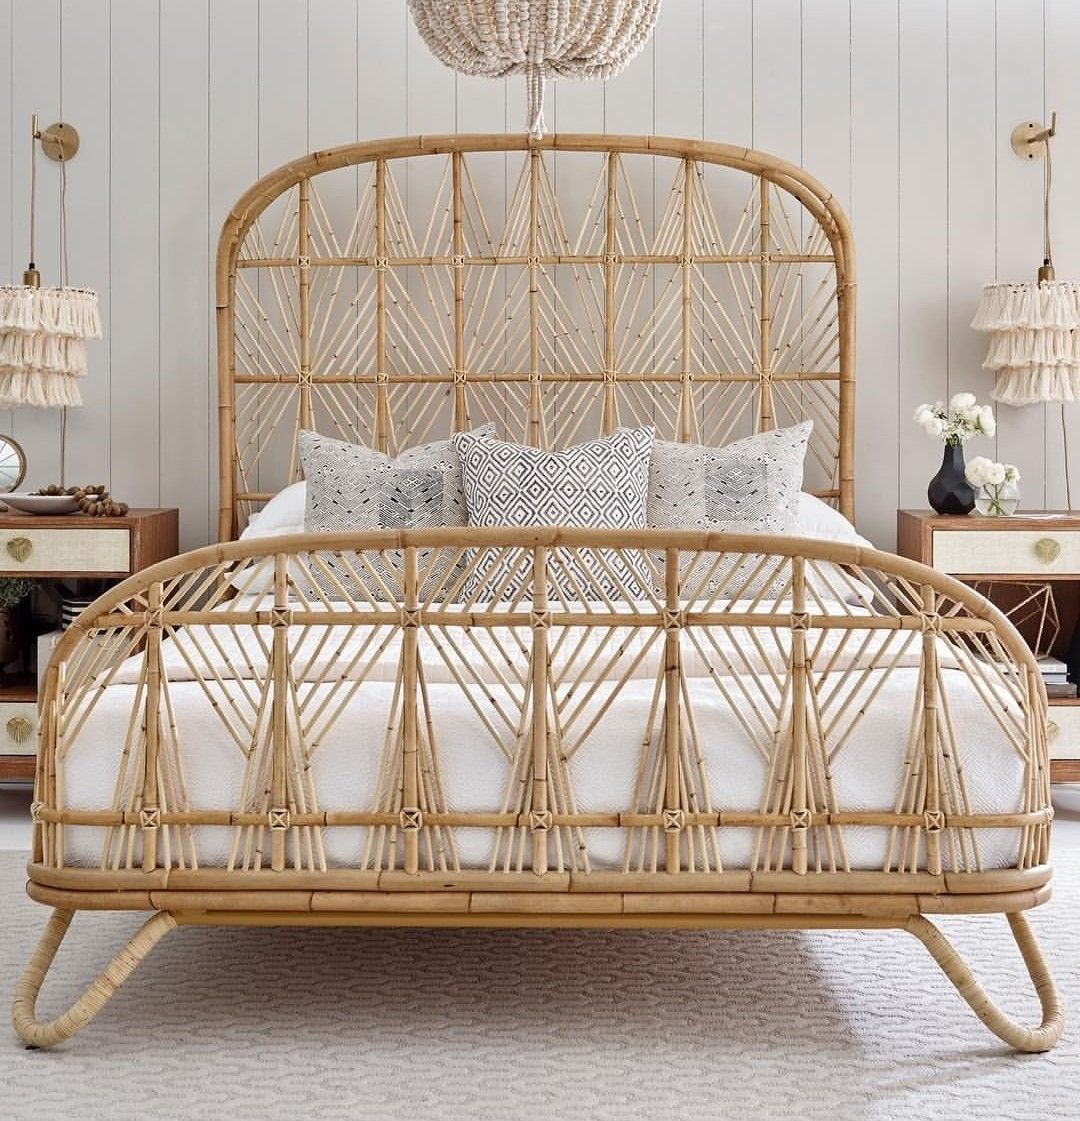 Pin by bohoasis on Boho Decor   Rattan bed, Bedroom ... on Modern Boho Bed Frame  id=12910